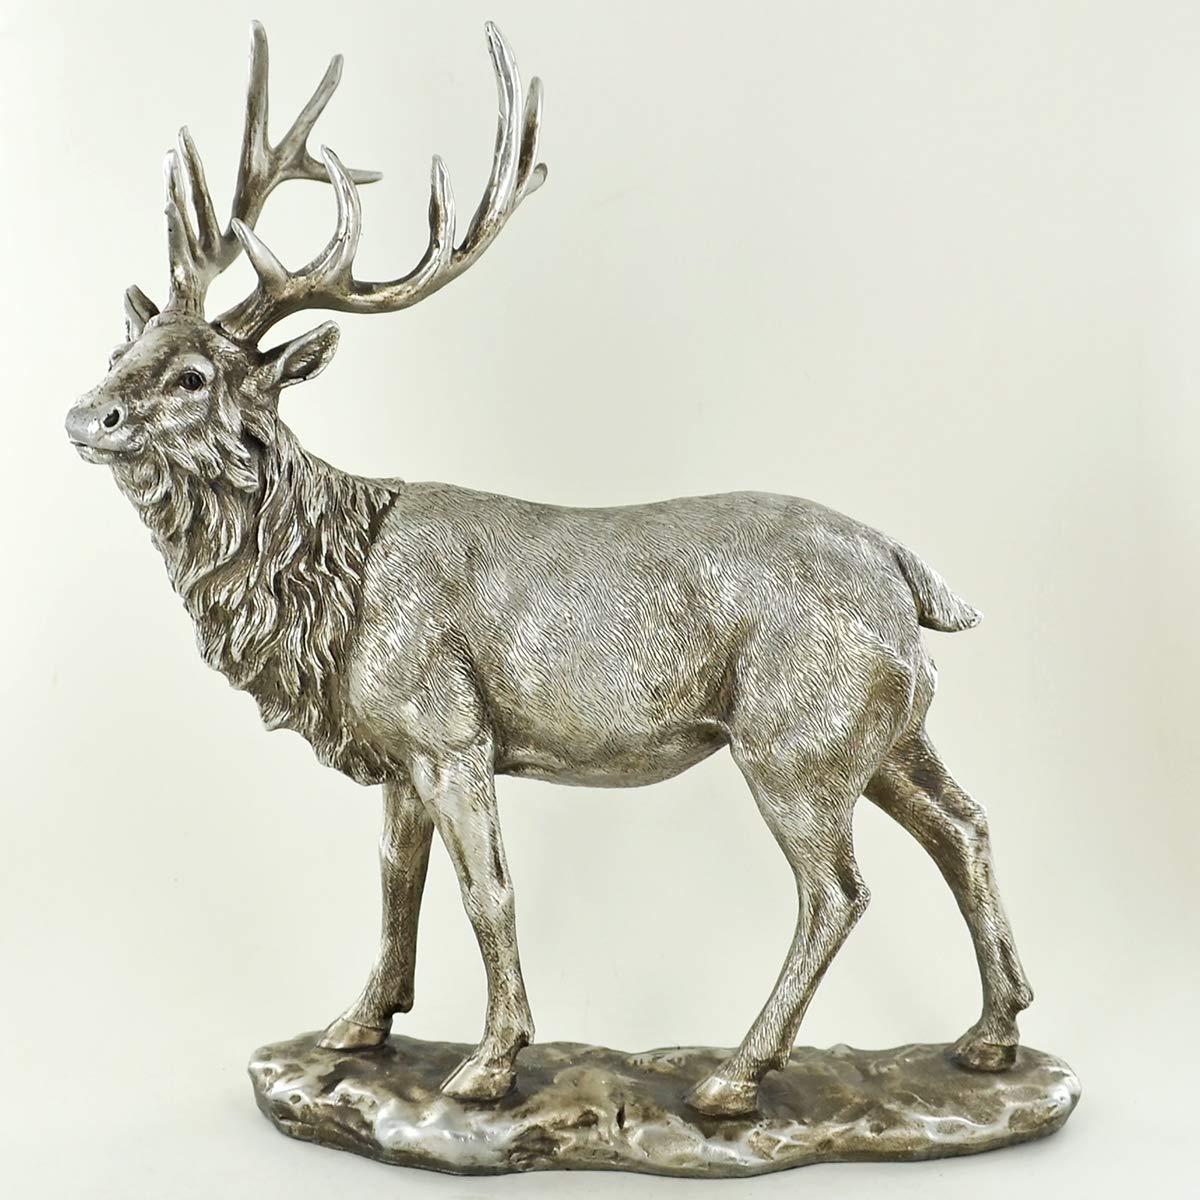 Prezents.com Stag in Antique Silver Sculpture Beautiful Home Decor or Gift Idea H28cm